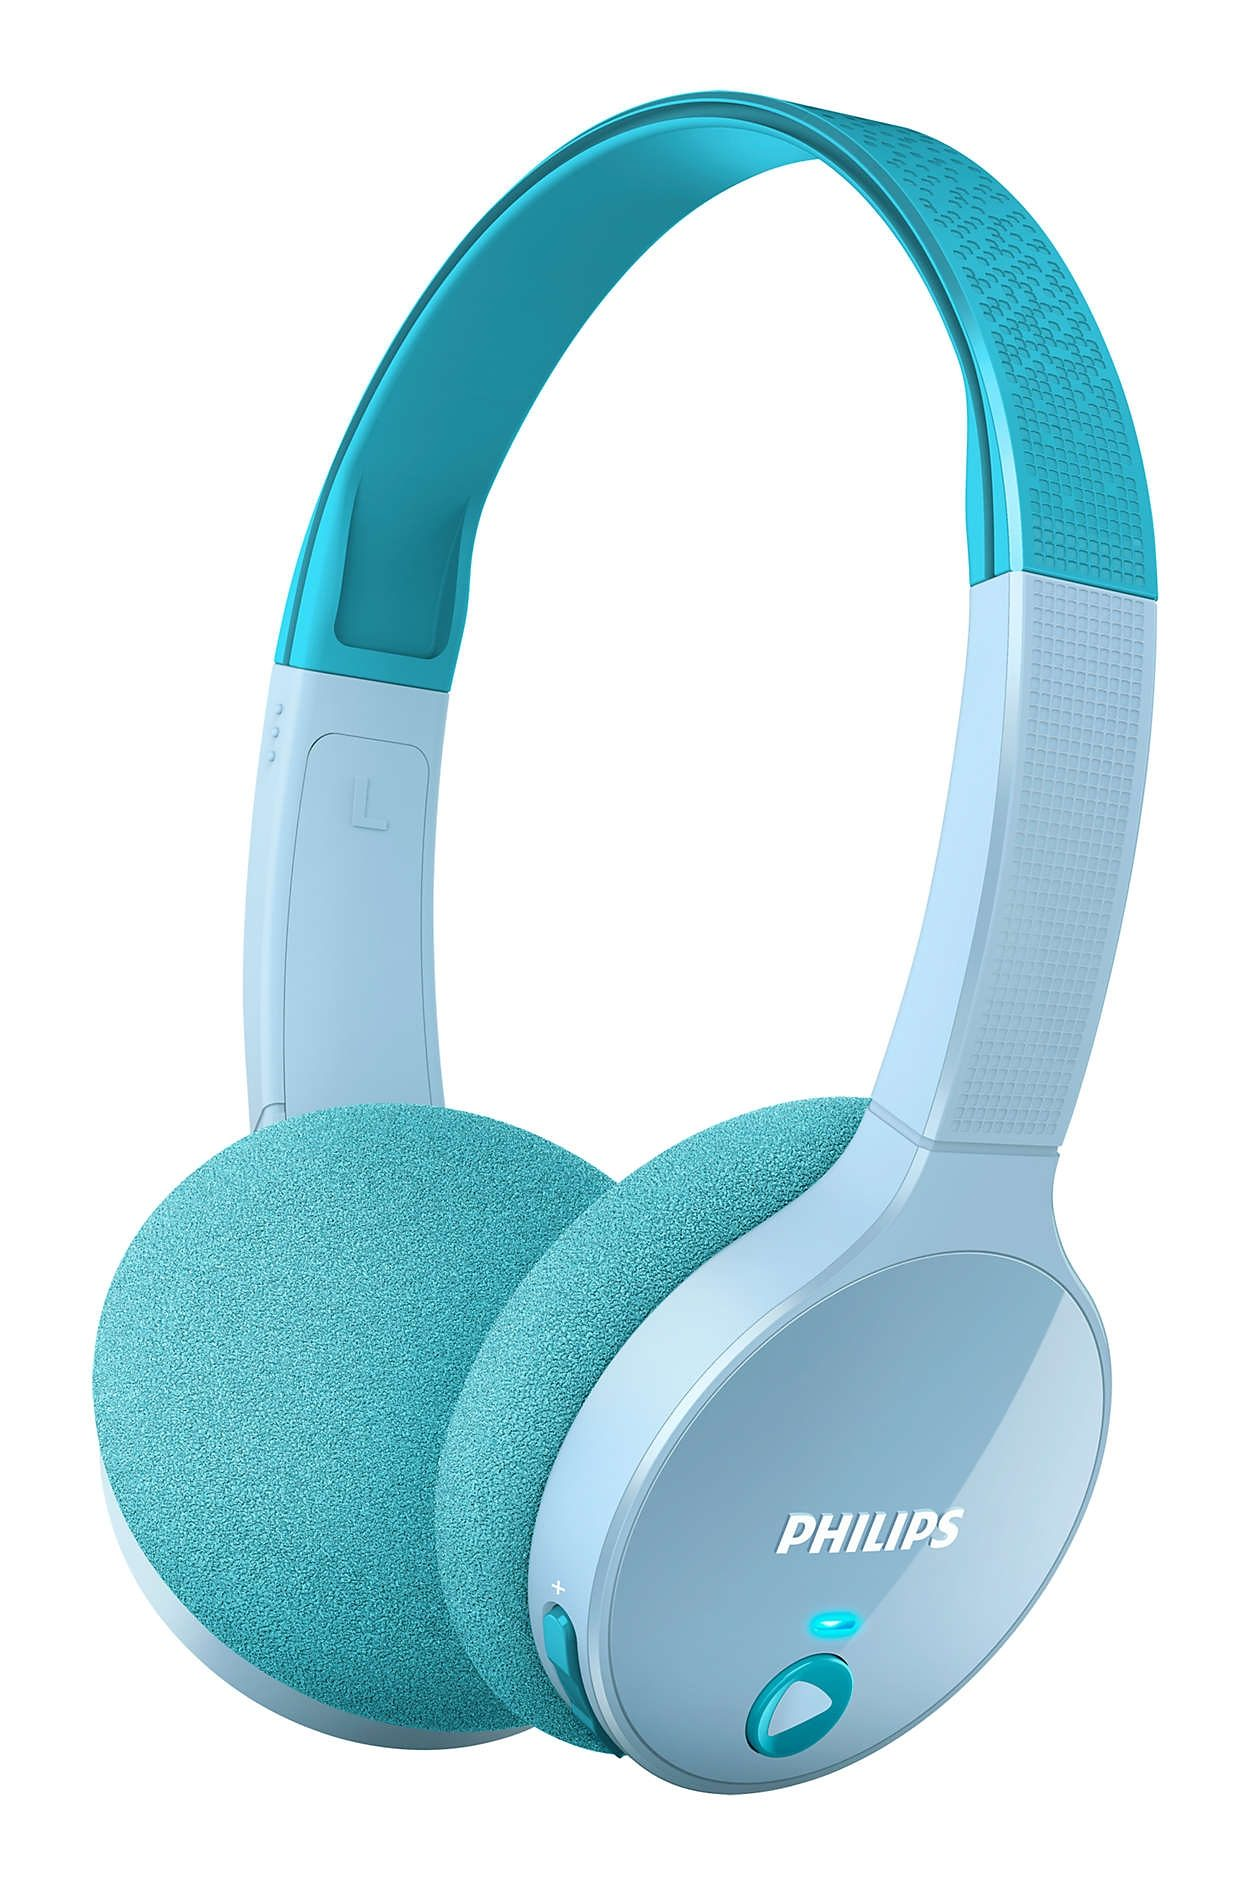 Philips Kinderkopfhörer »SHK4000/00«